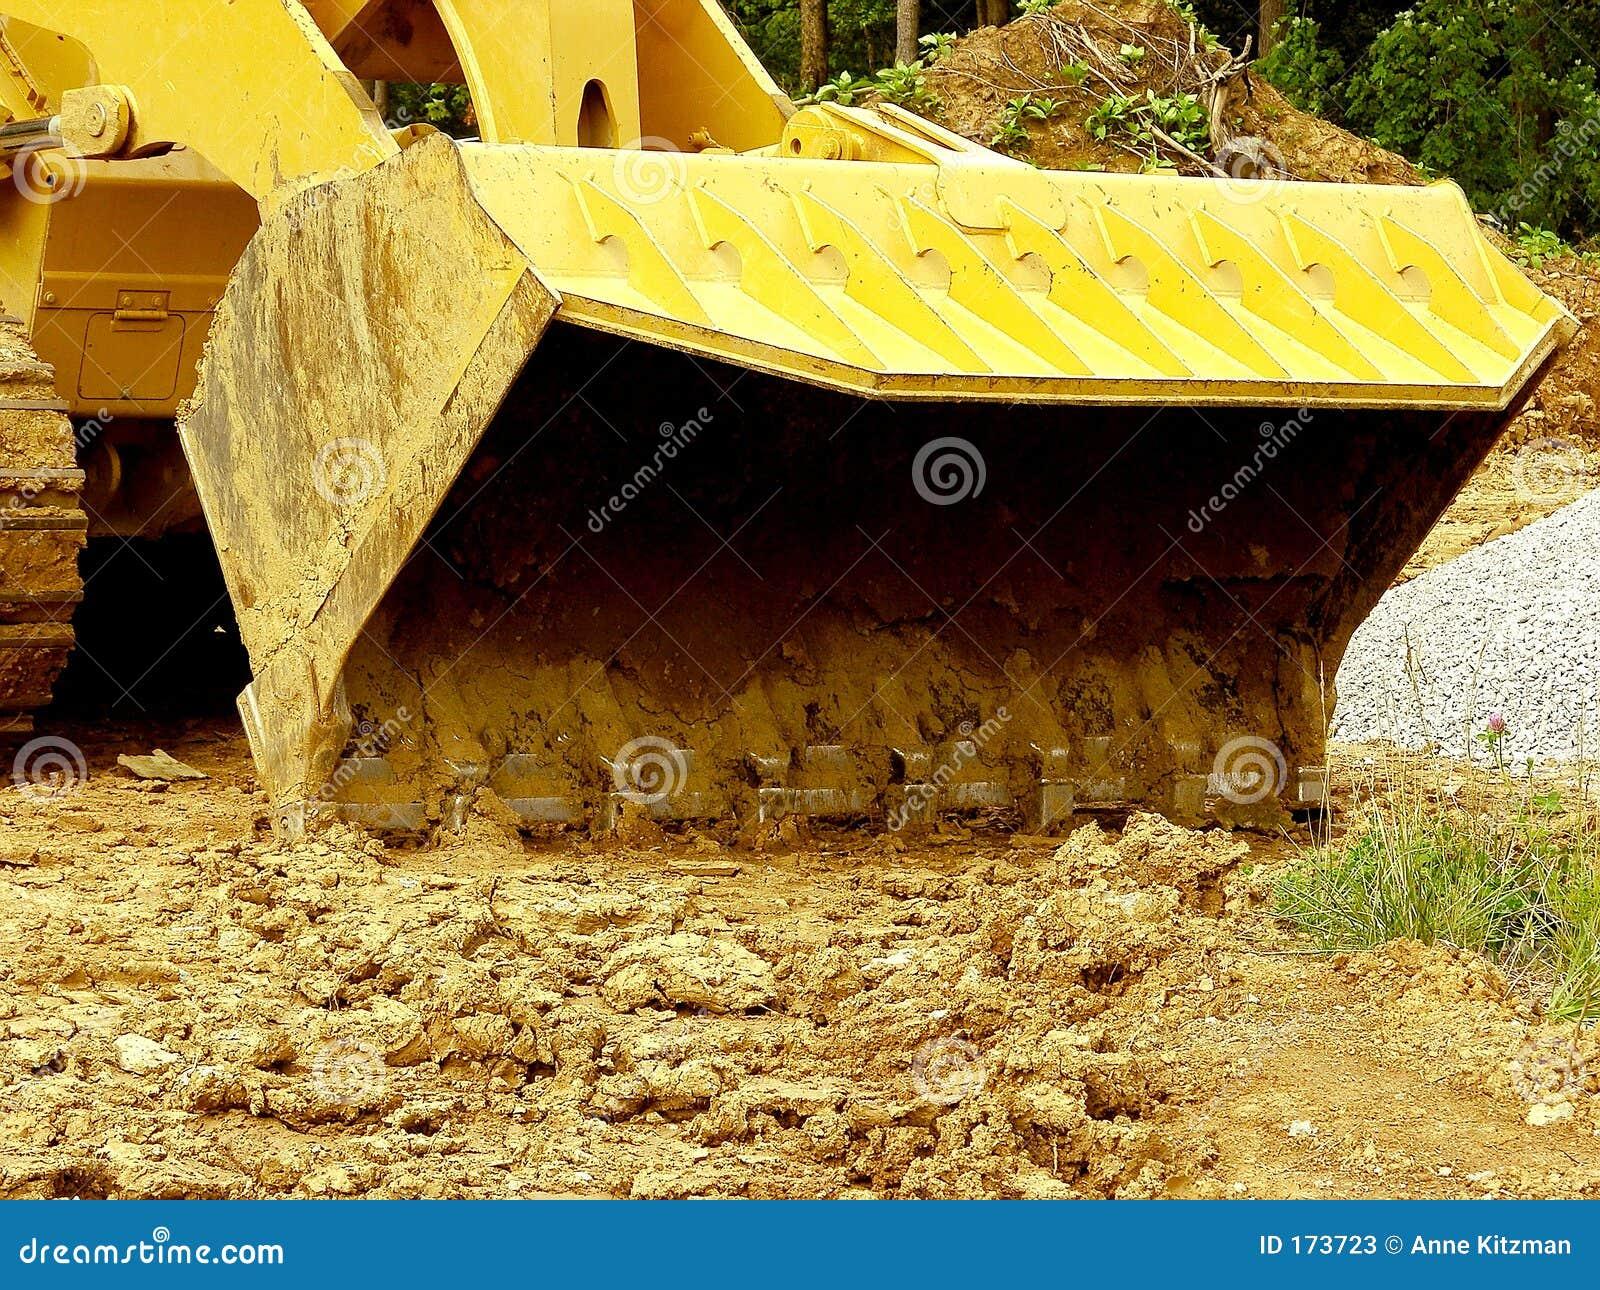 Construction - Got the Scoop!